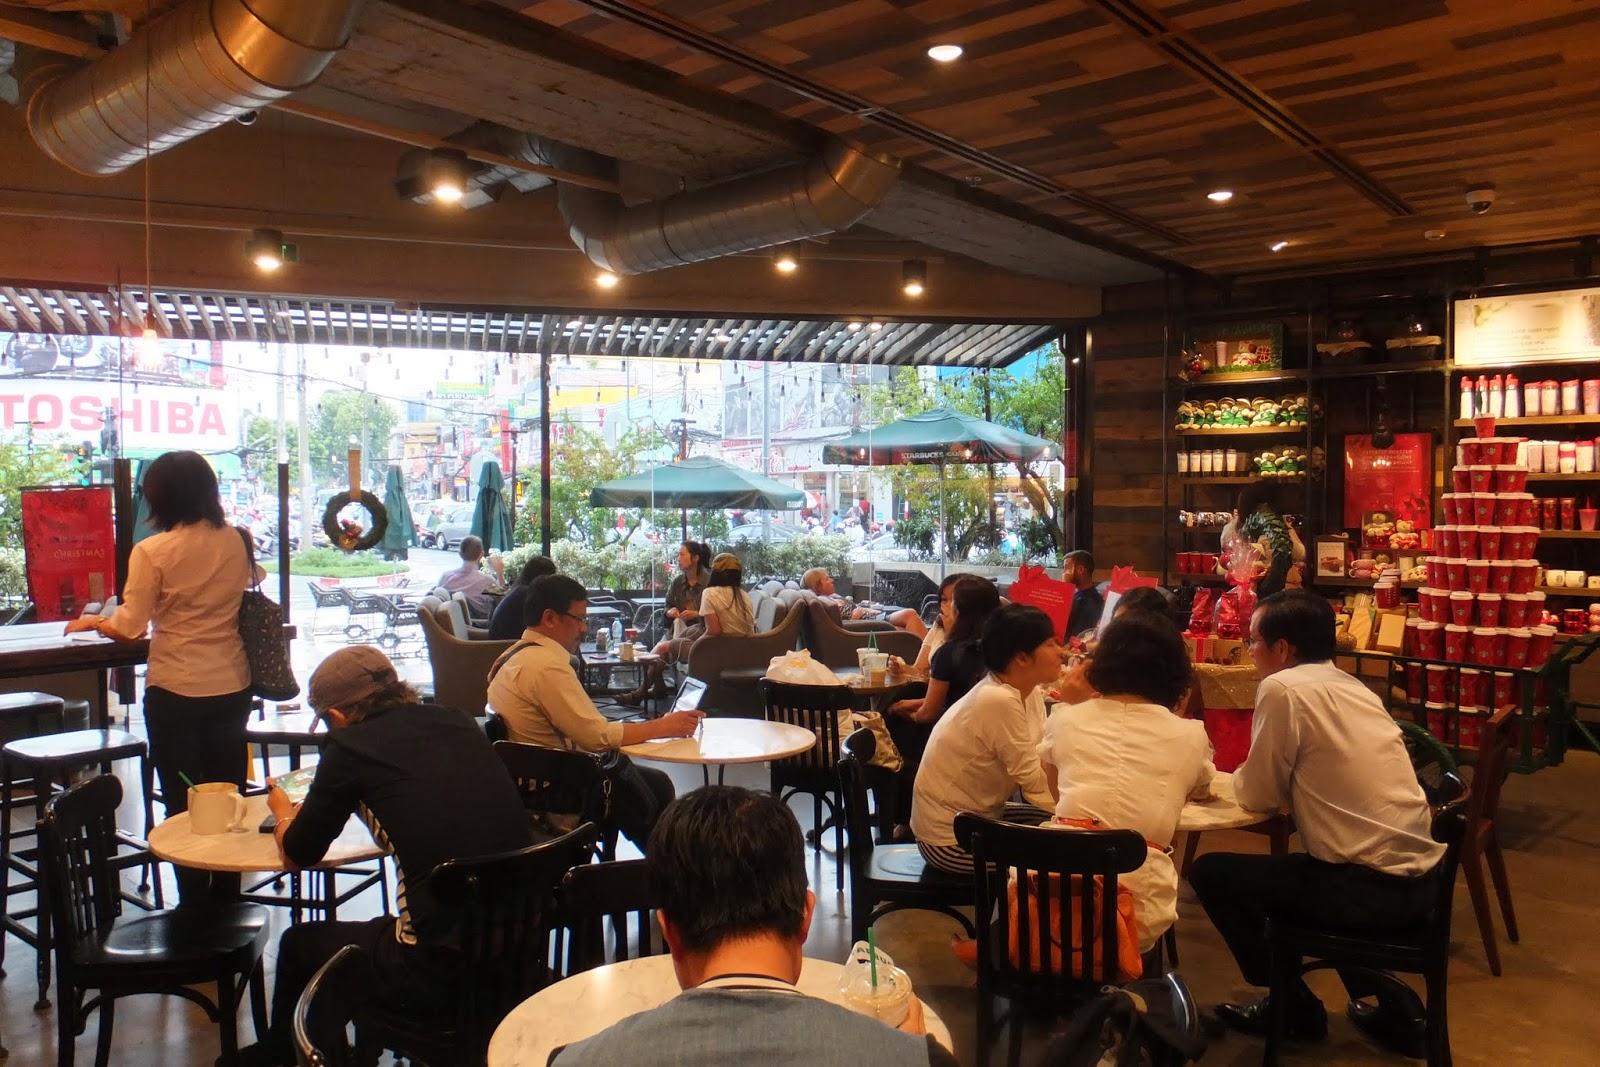 starbucks-coffee-vietnam-first-interior スターバックスコーヒーベトナム第1号店の店内